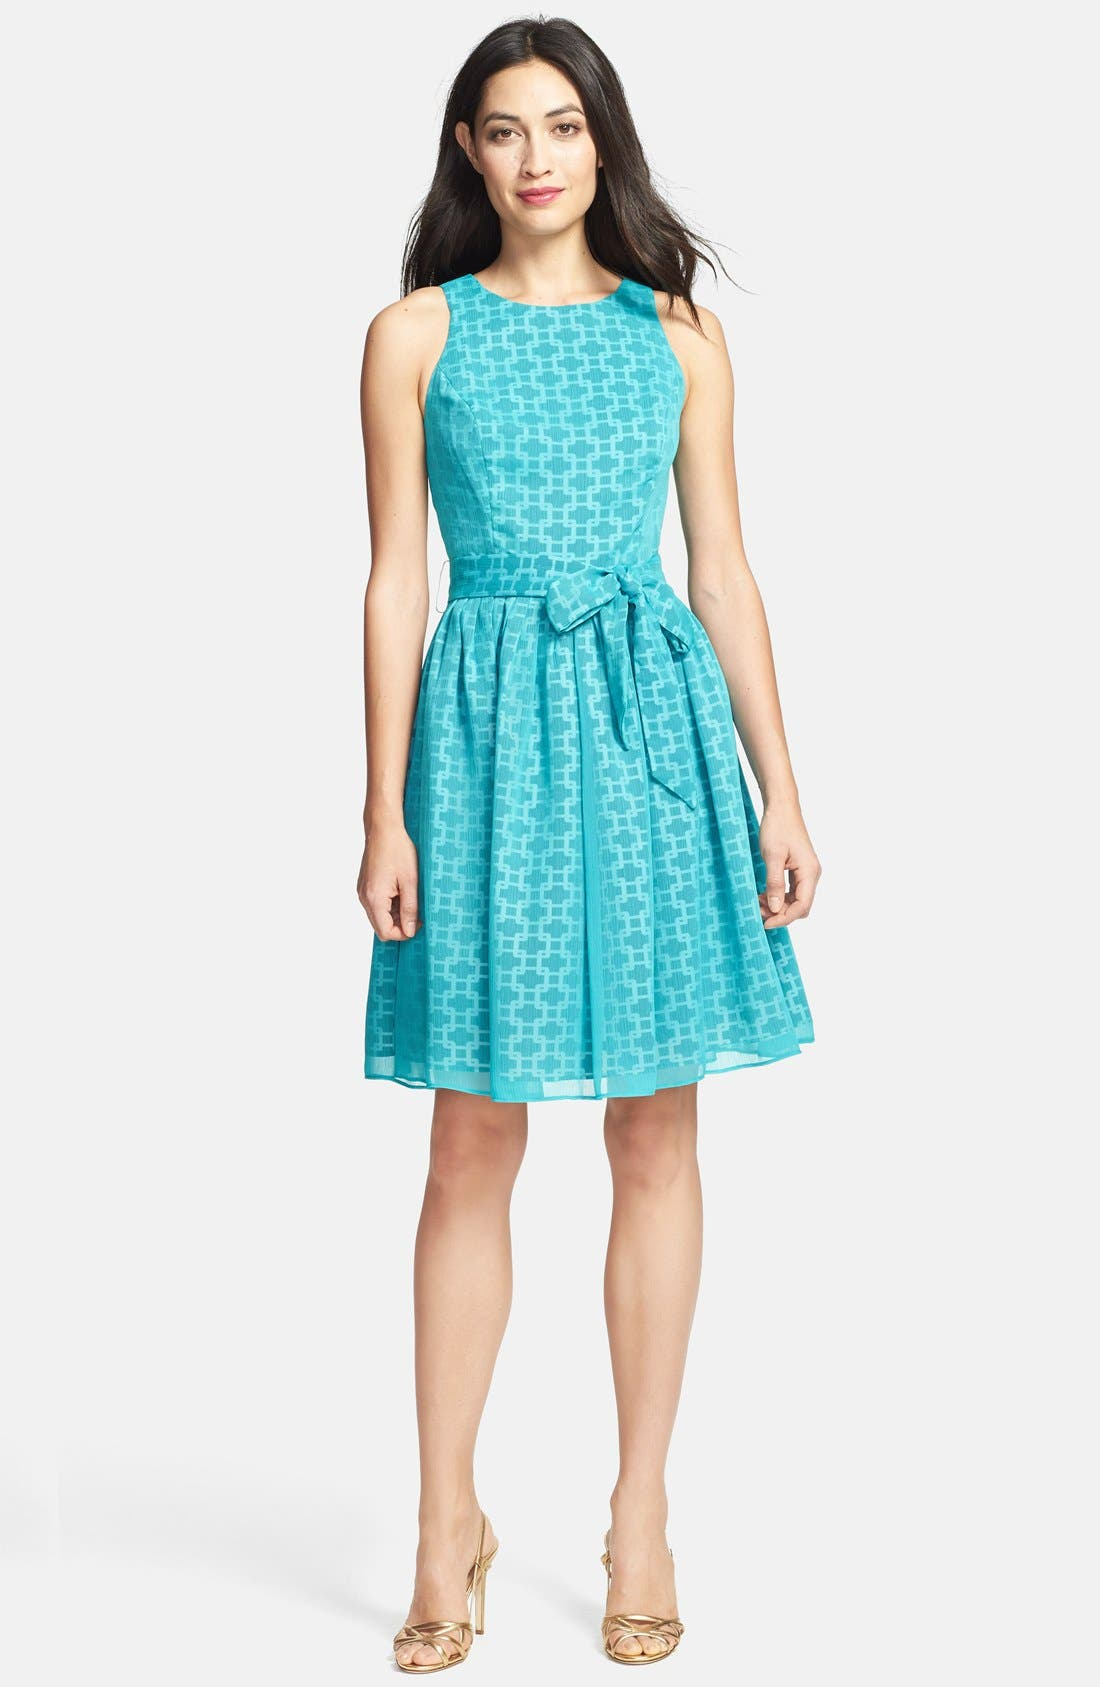 Alternate Image 1 Selected - Isaac Mizrahi New York Print Chiffon Fit & Flare Dress (Petite)